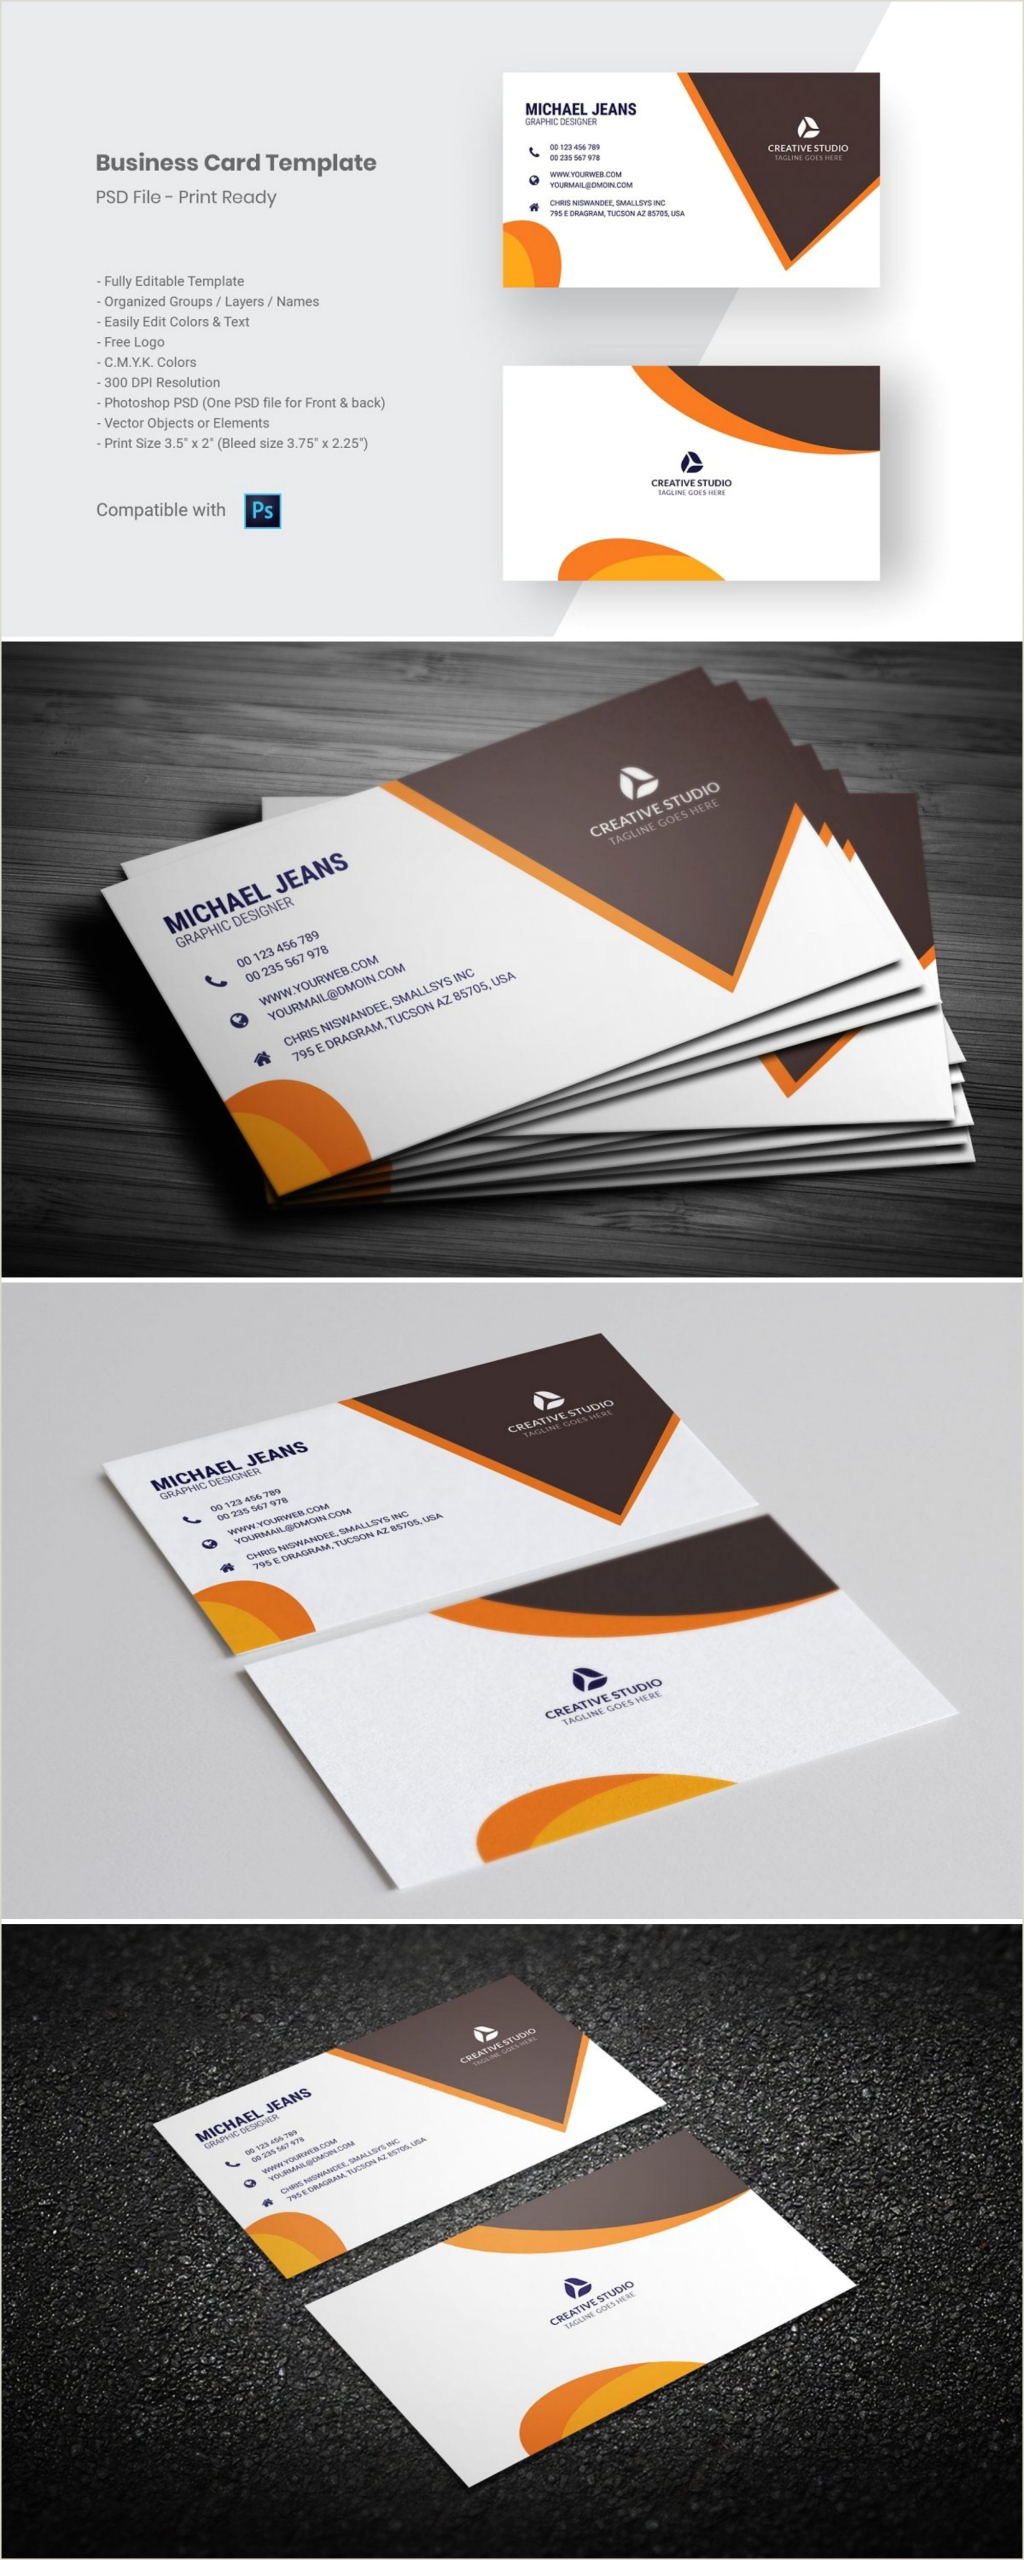 Social Media Marketing Best Business Cards Modern Business Card Template